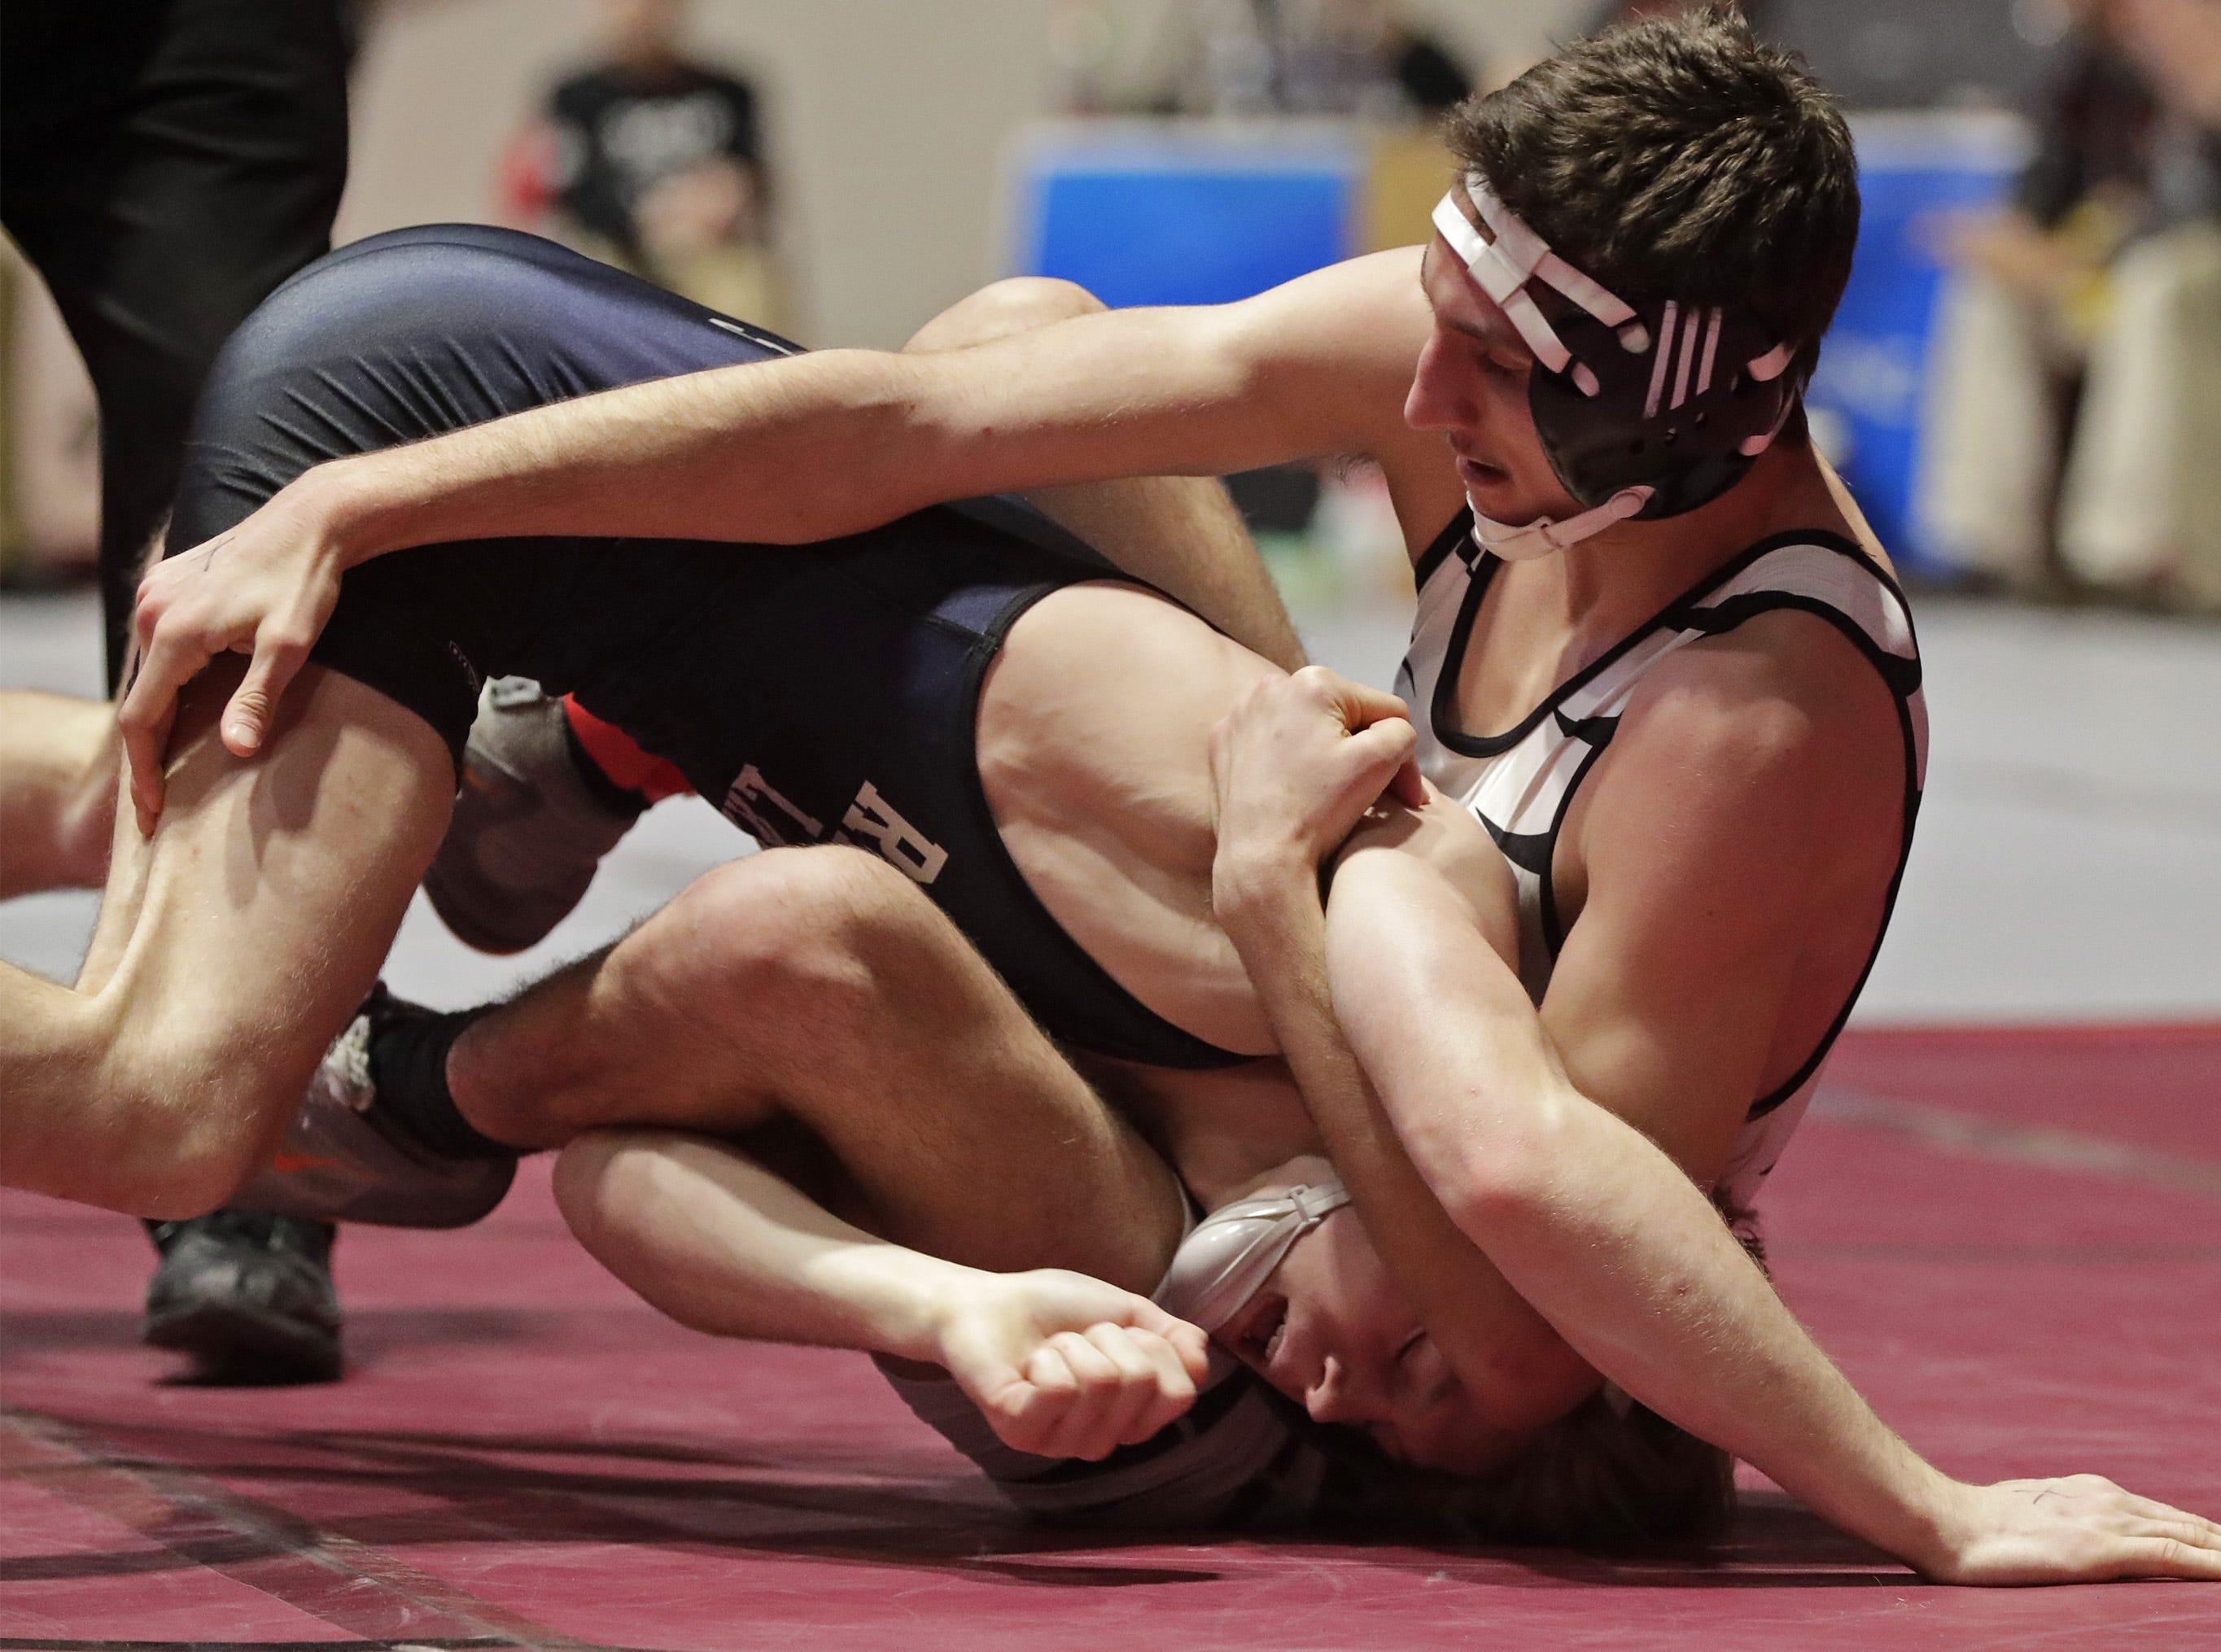 Stratford's Oscar Telschow, right, wrestles Random Lake's Aiden Vandenbush in a 152-pound match, Saturday, March 2, 2019, in Madison, Wis.